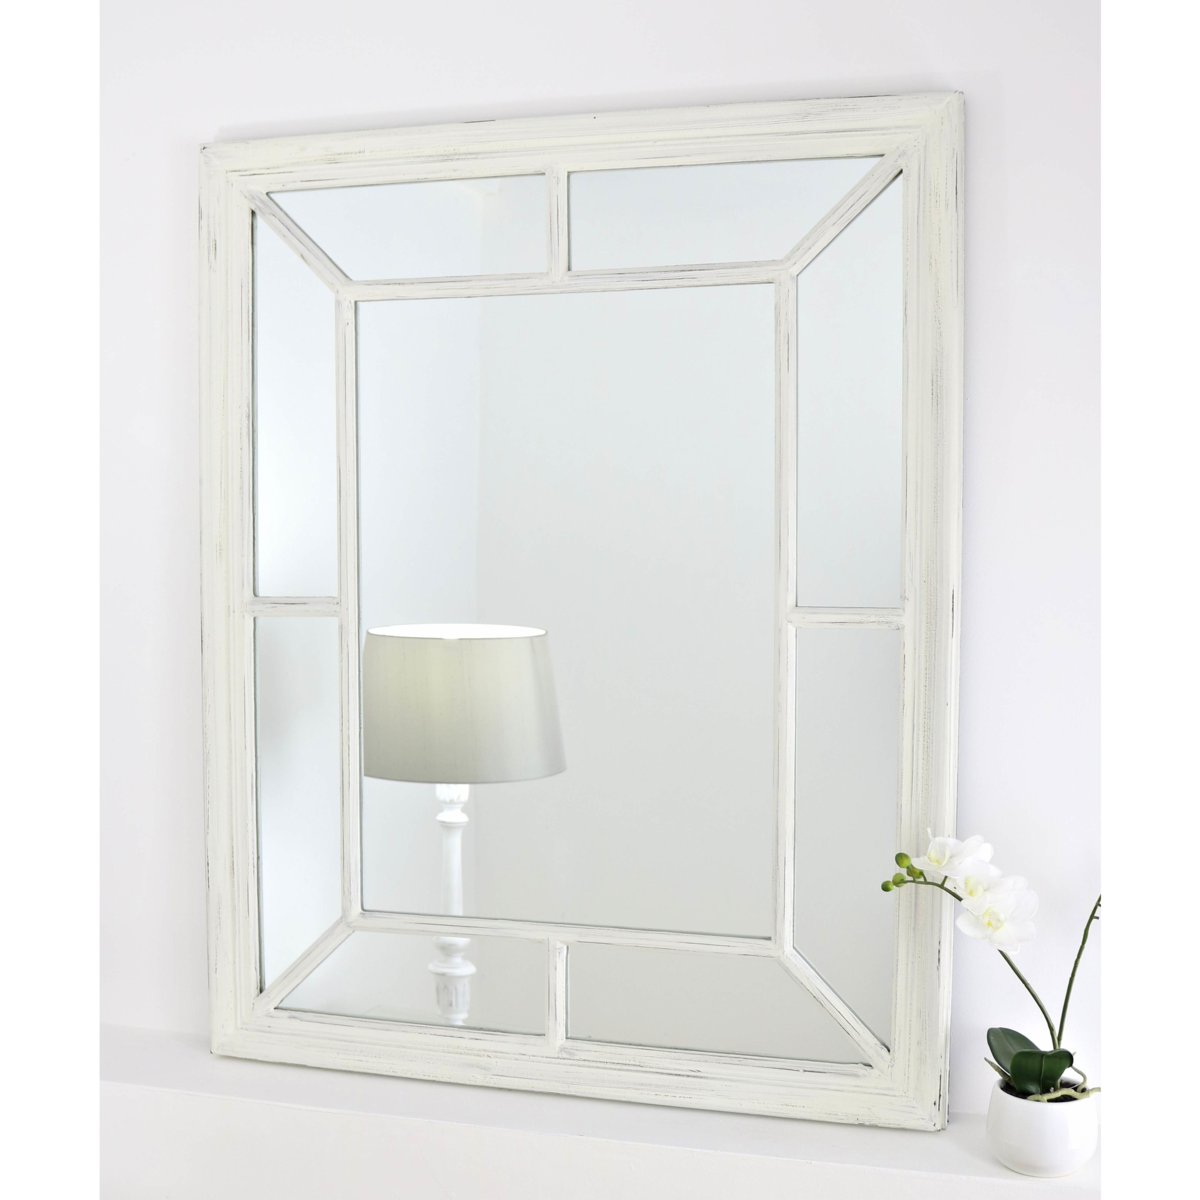 Marseilles Vintage White Shabby Chic Rectangular Mirror 40 X 32 100cm X 80cm In 2020 Home Interior Accessories Shabby Chic Mirror White Ornate Mirror